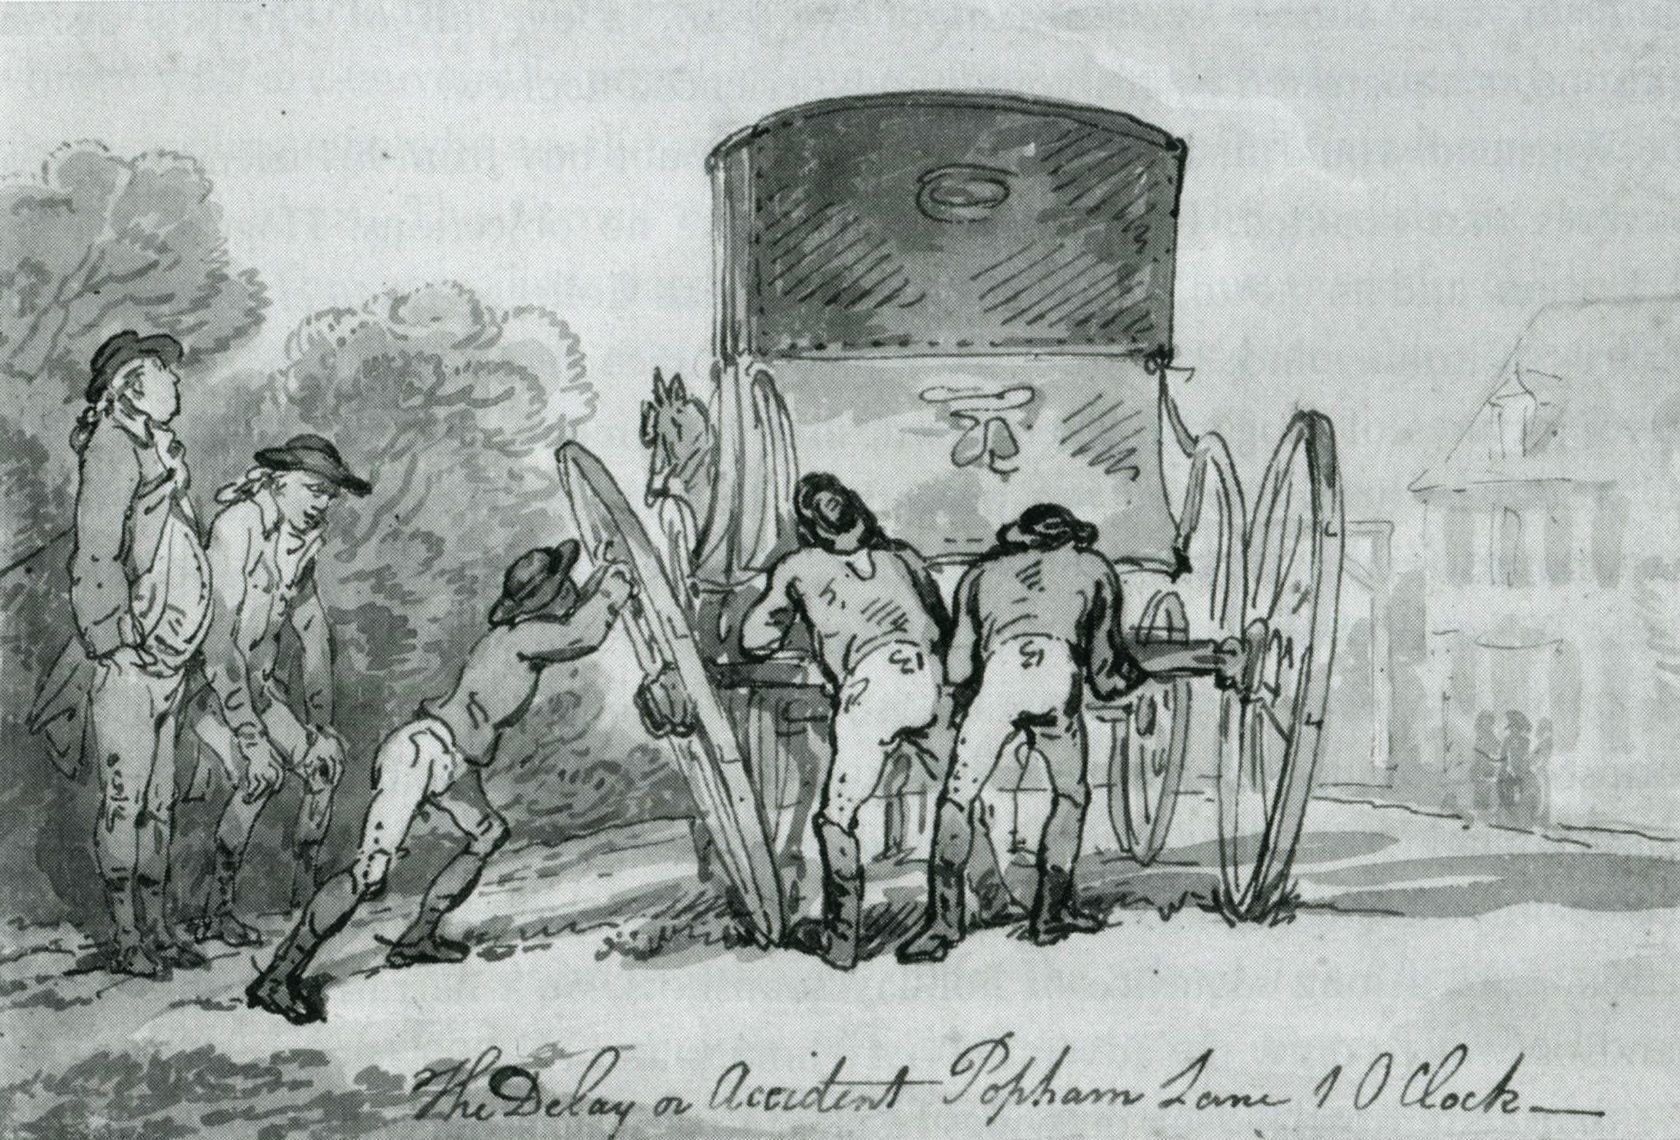 The Delay or Accident on Popham Lane, 10 am, 1784, Thomas Rowlandson